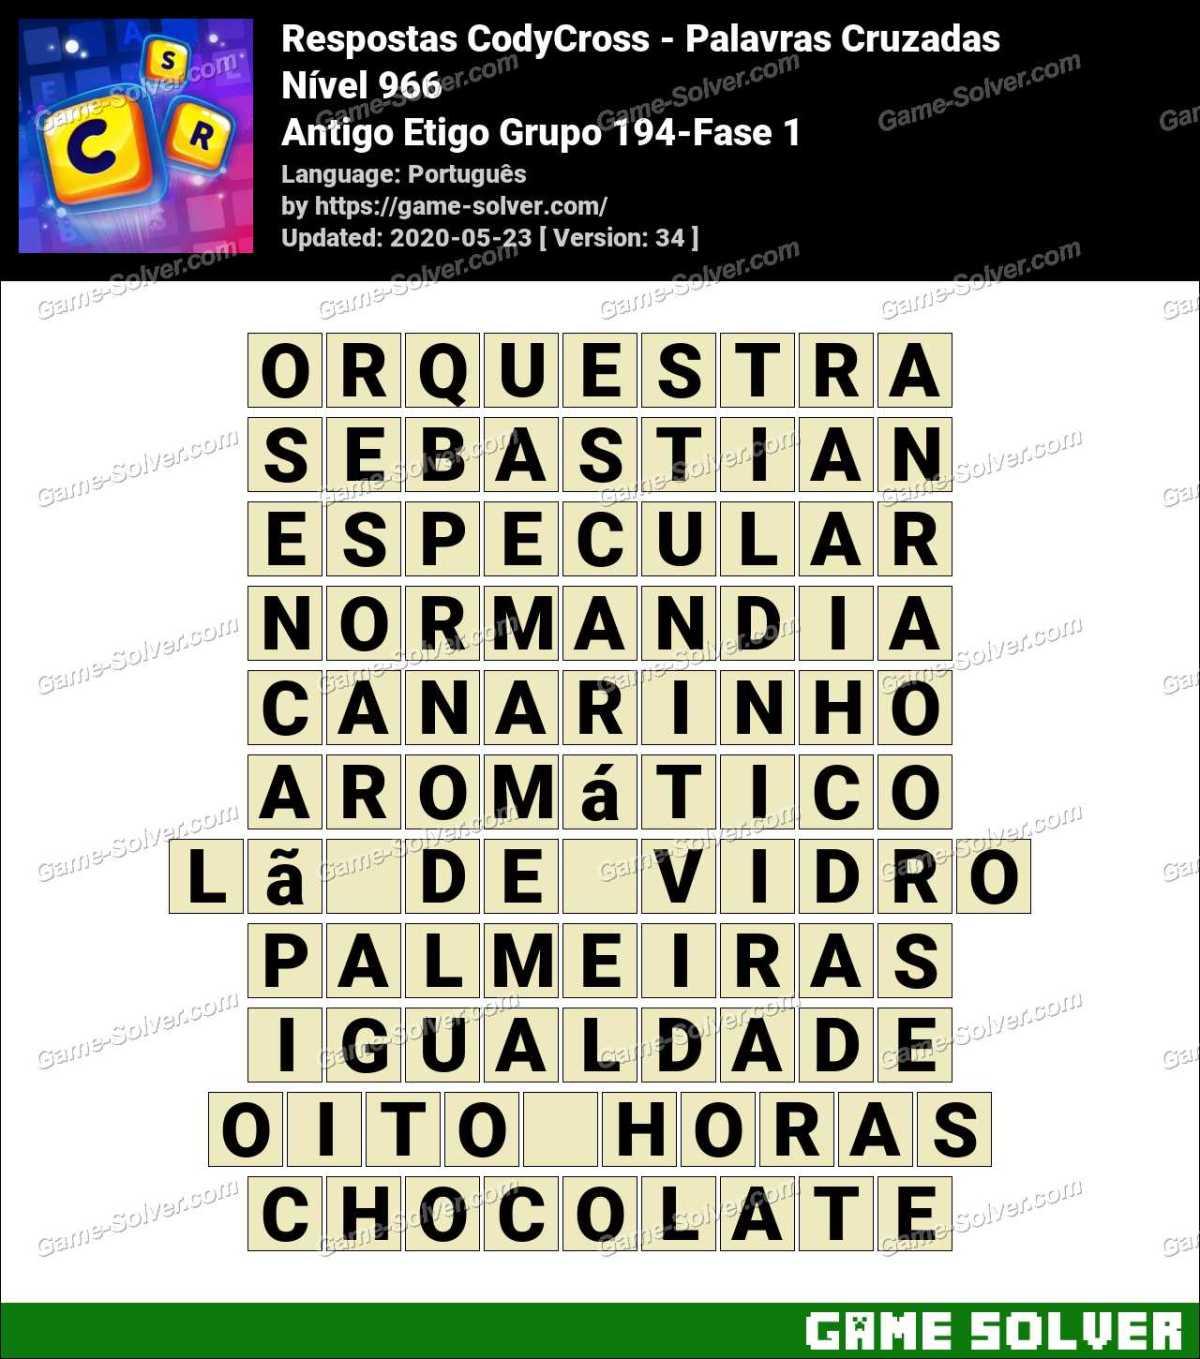 Respostas CodyCross Antigo Etigo Grupo 194-Fase 1